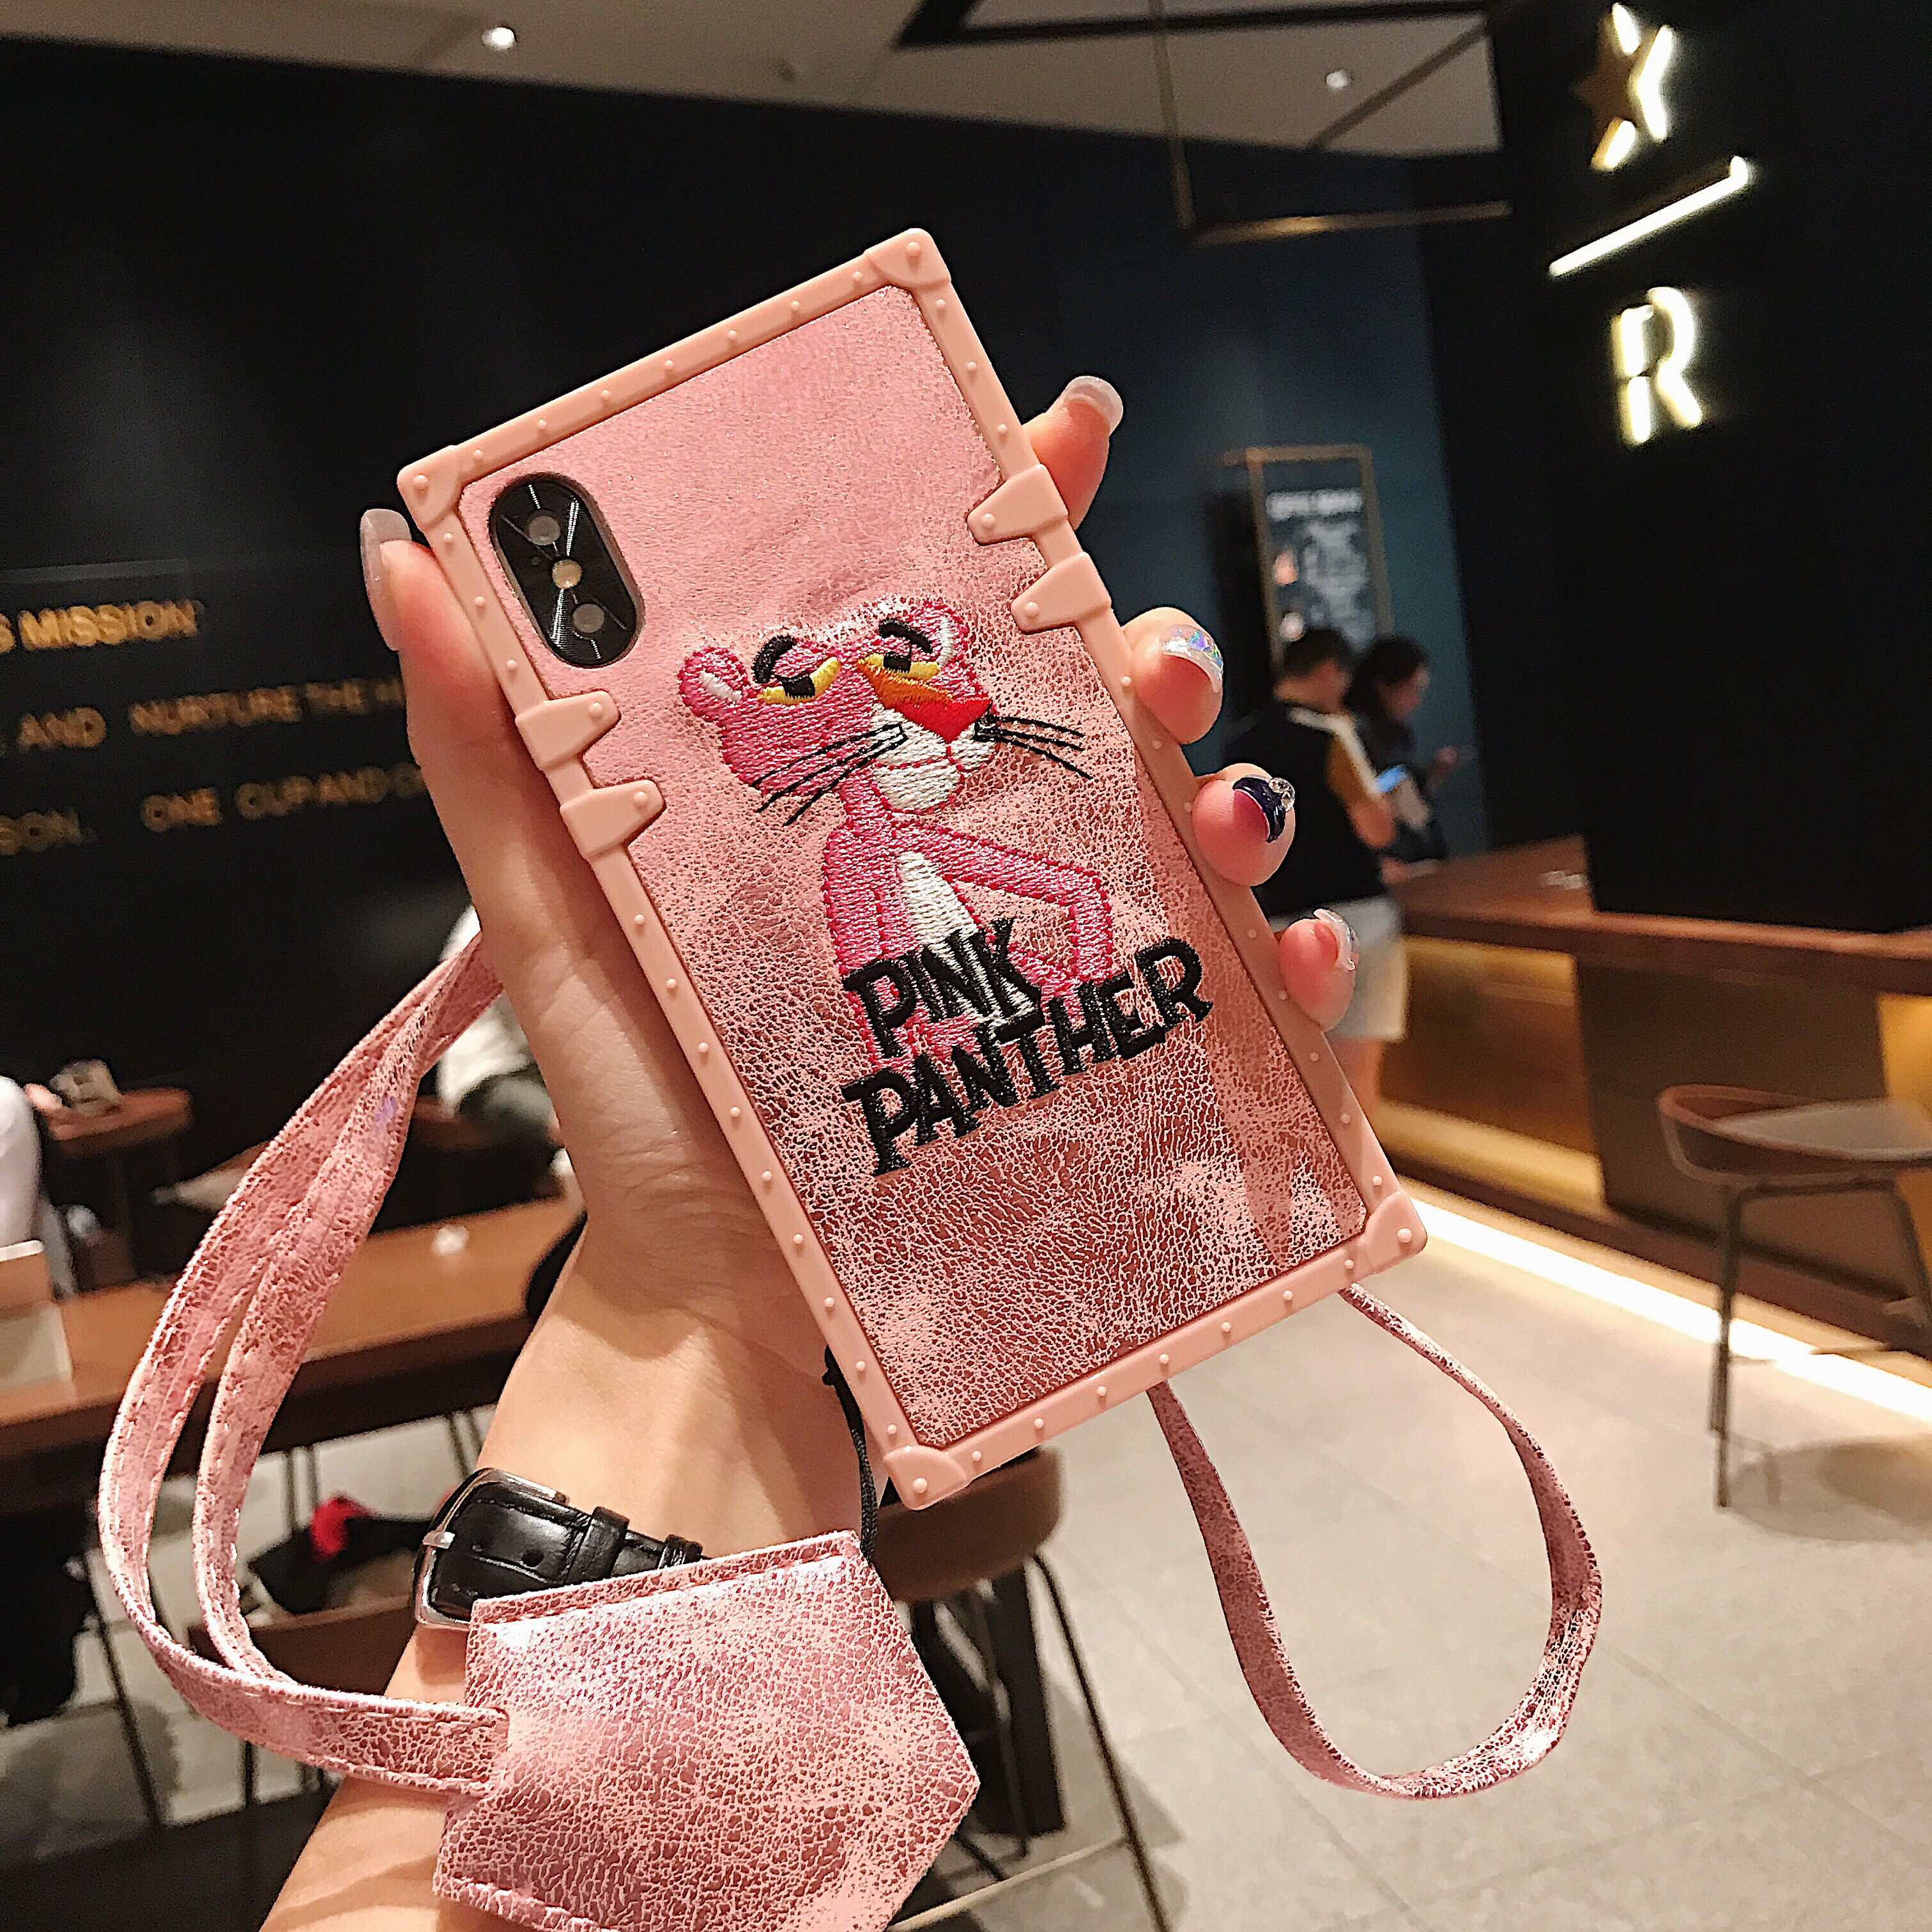 Barbie Pantera Rosa, marca de moda de dibujos animados comics, funda de teléfono móvil resistente a roturas, adecuada para iphone6 a iphone11Pro